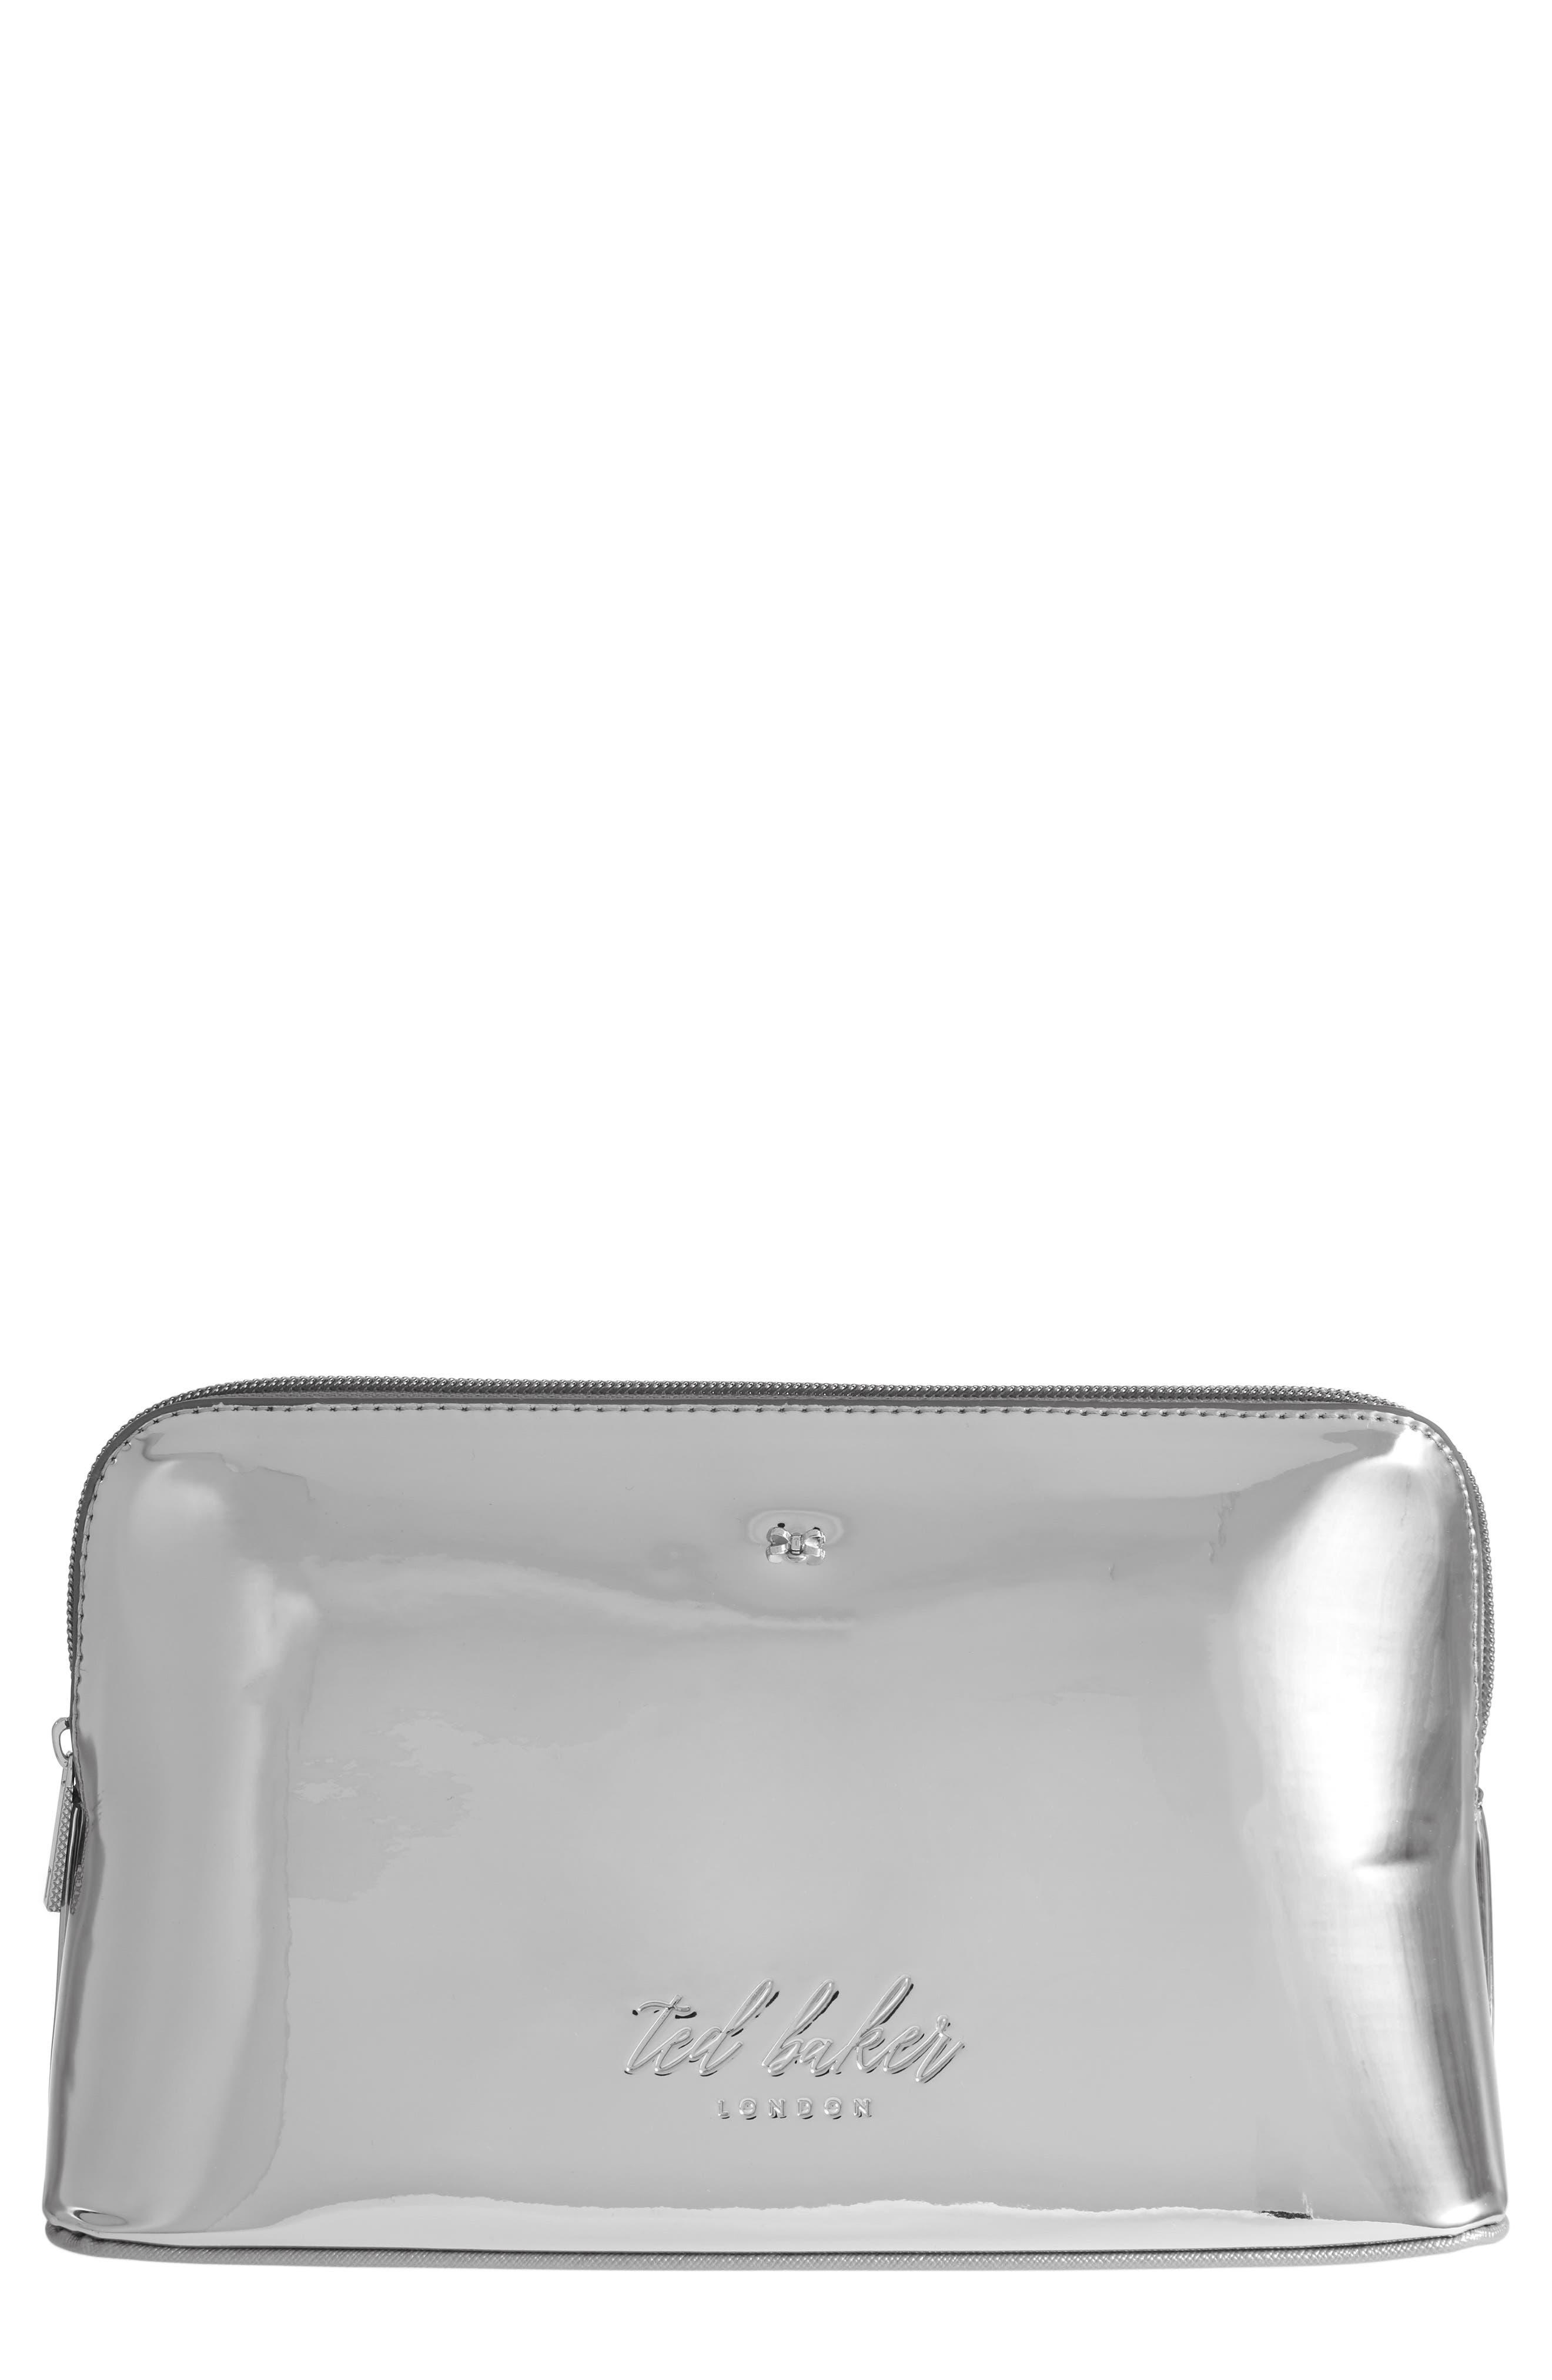 Main Image - Ted Baker London Lauran Mirrored Wash Bag